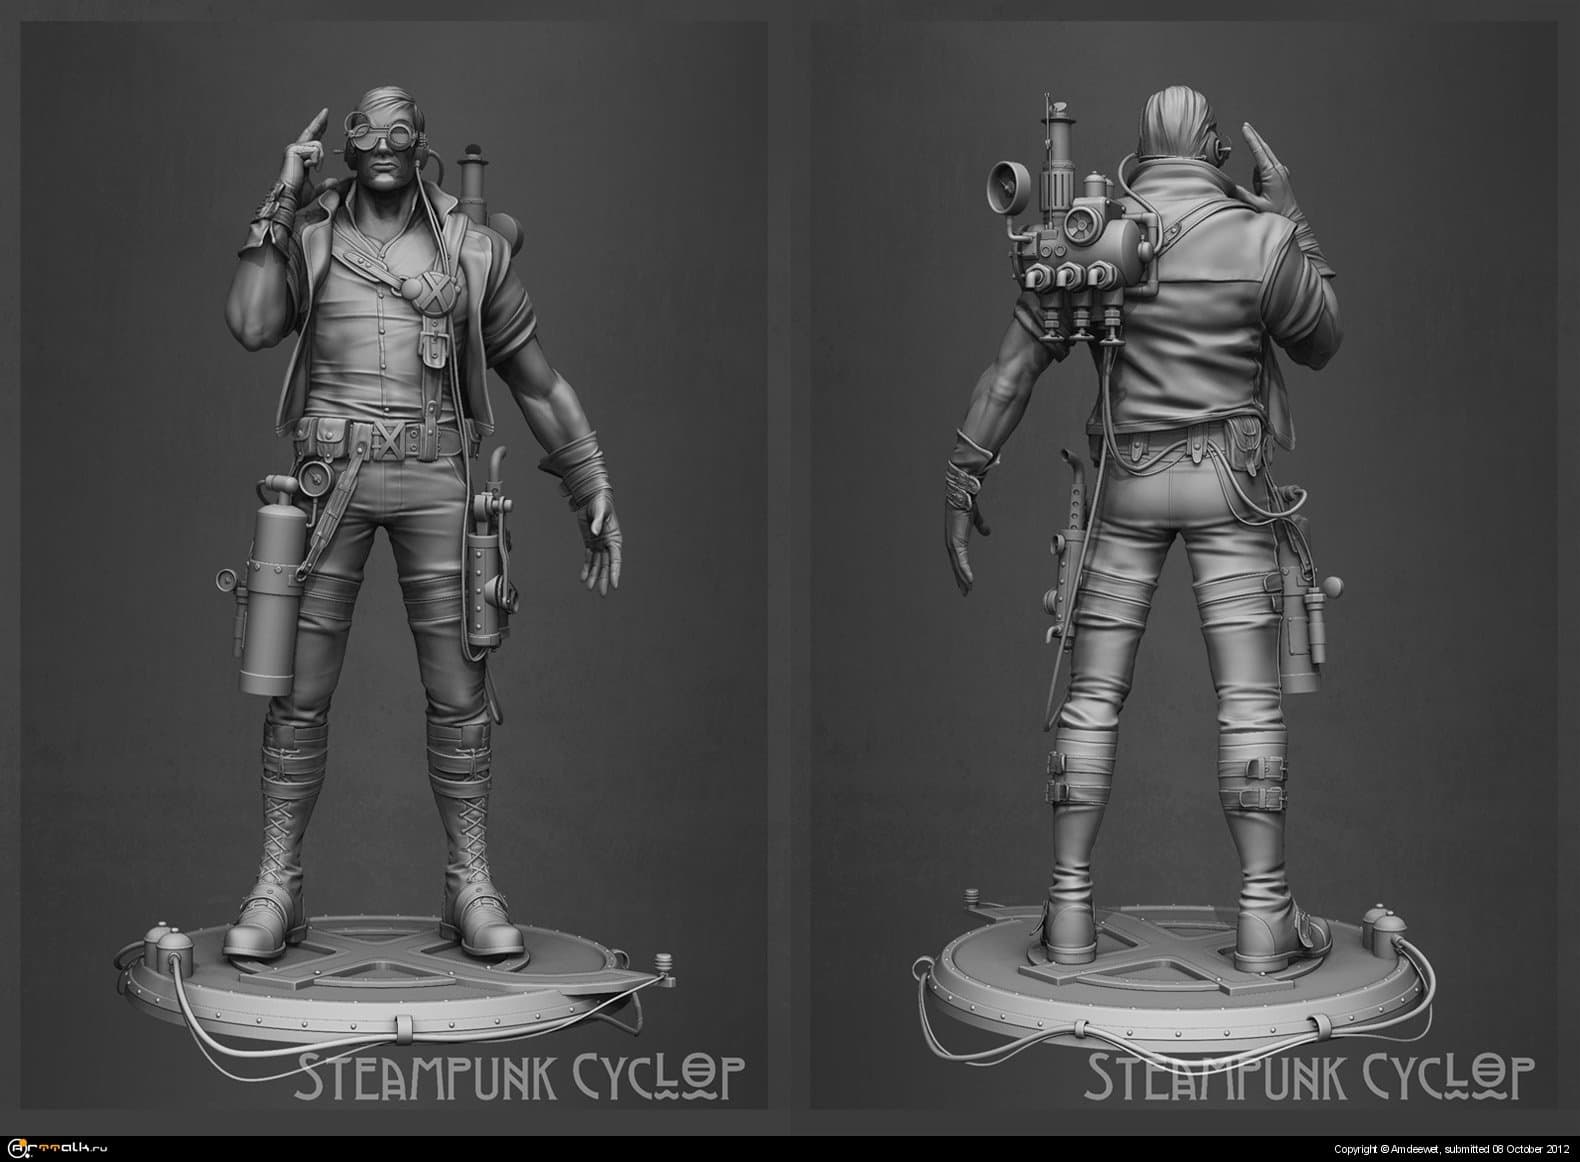 Steampunk Cyclop